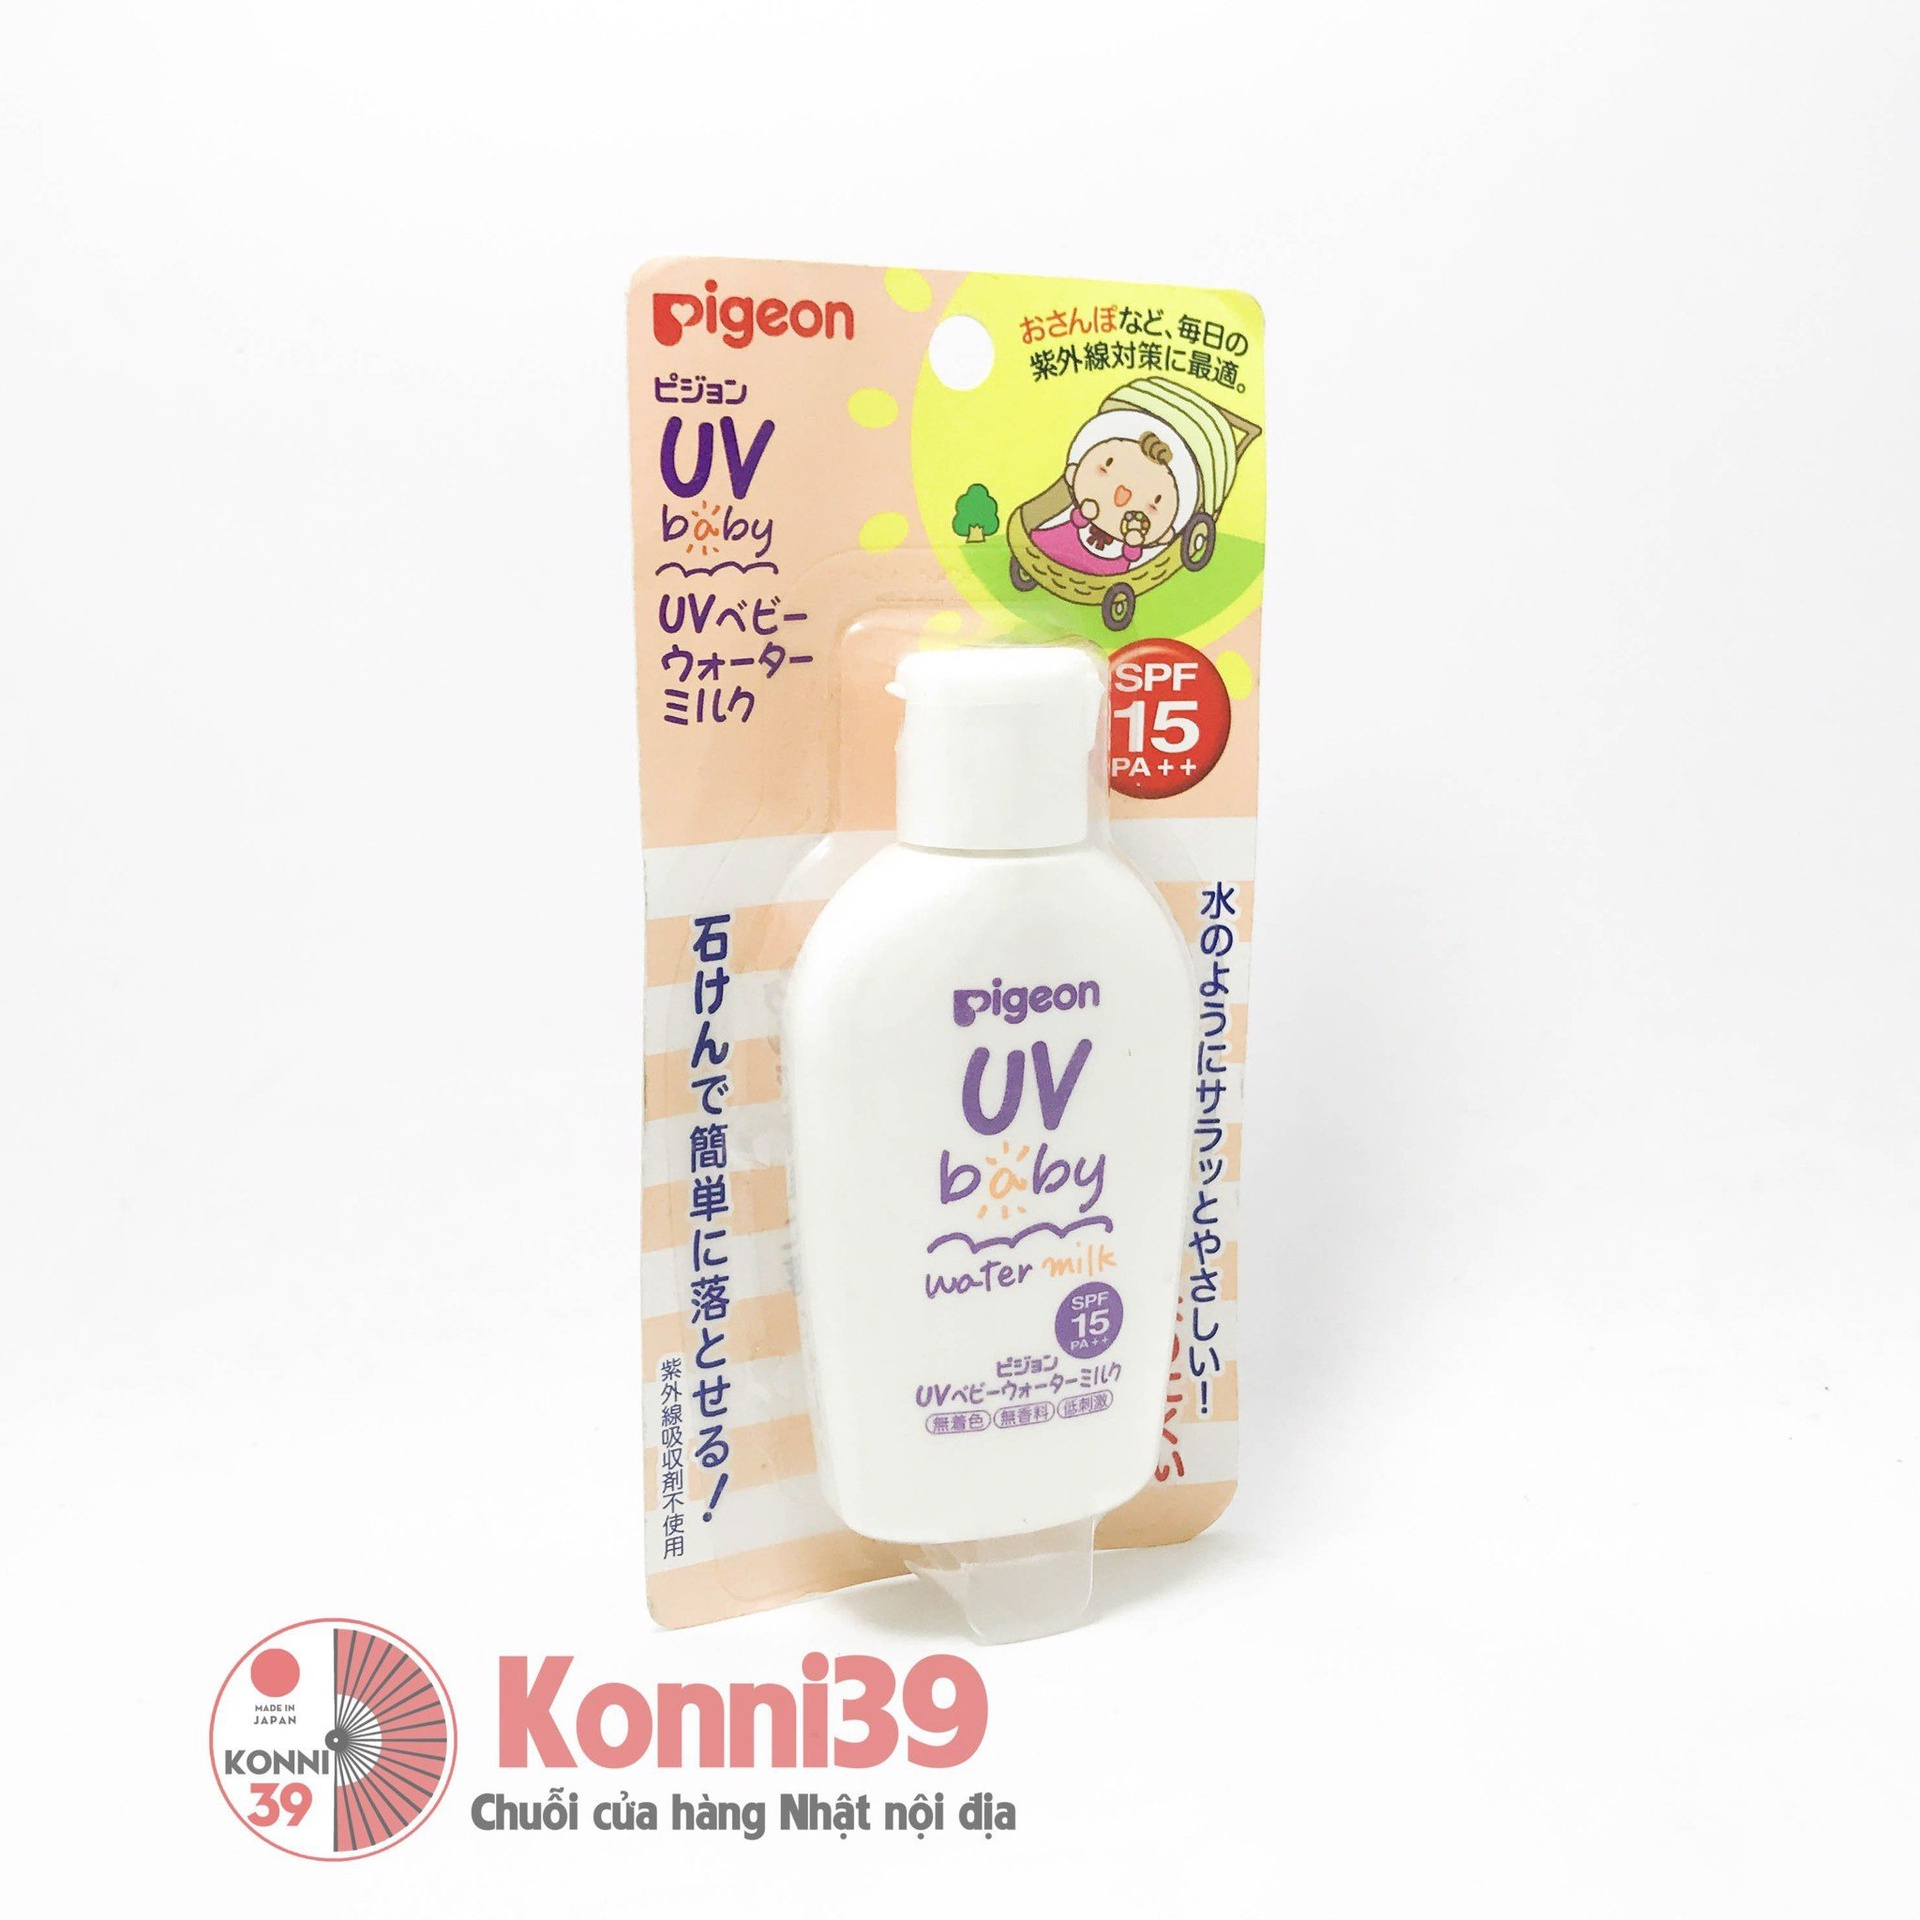 kcn-tre-em-uv-baby-milk-pigeon-30g